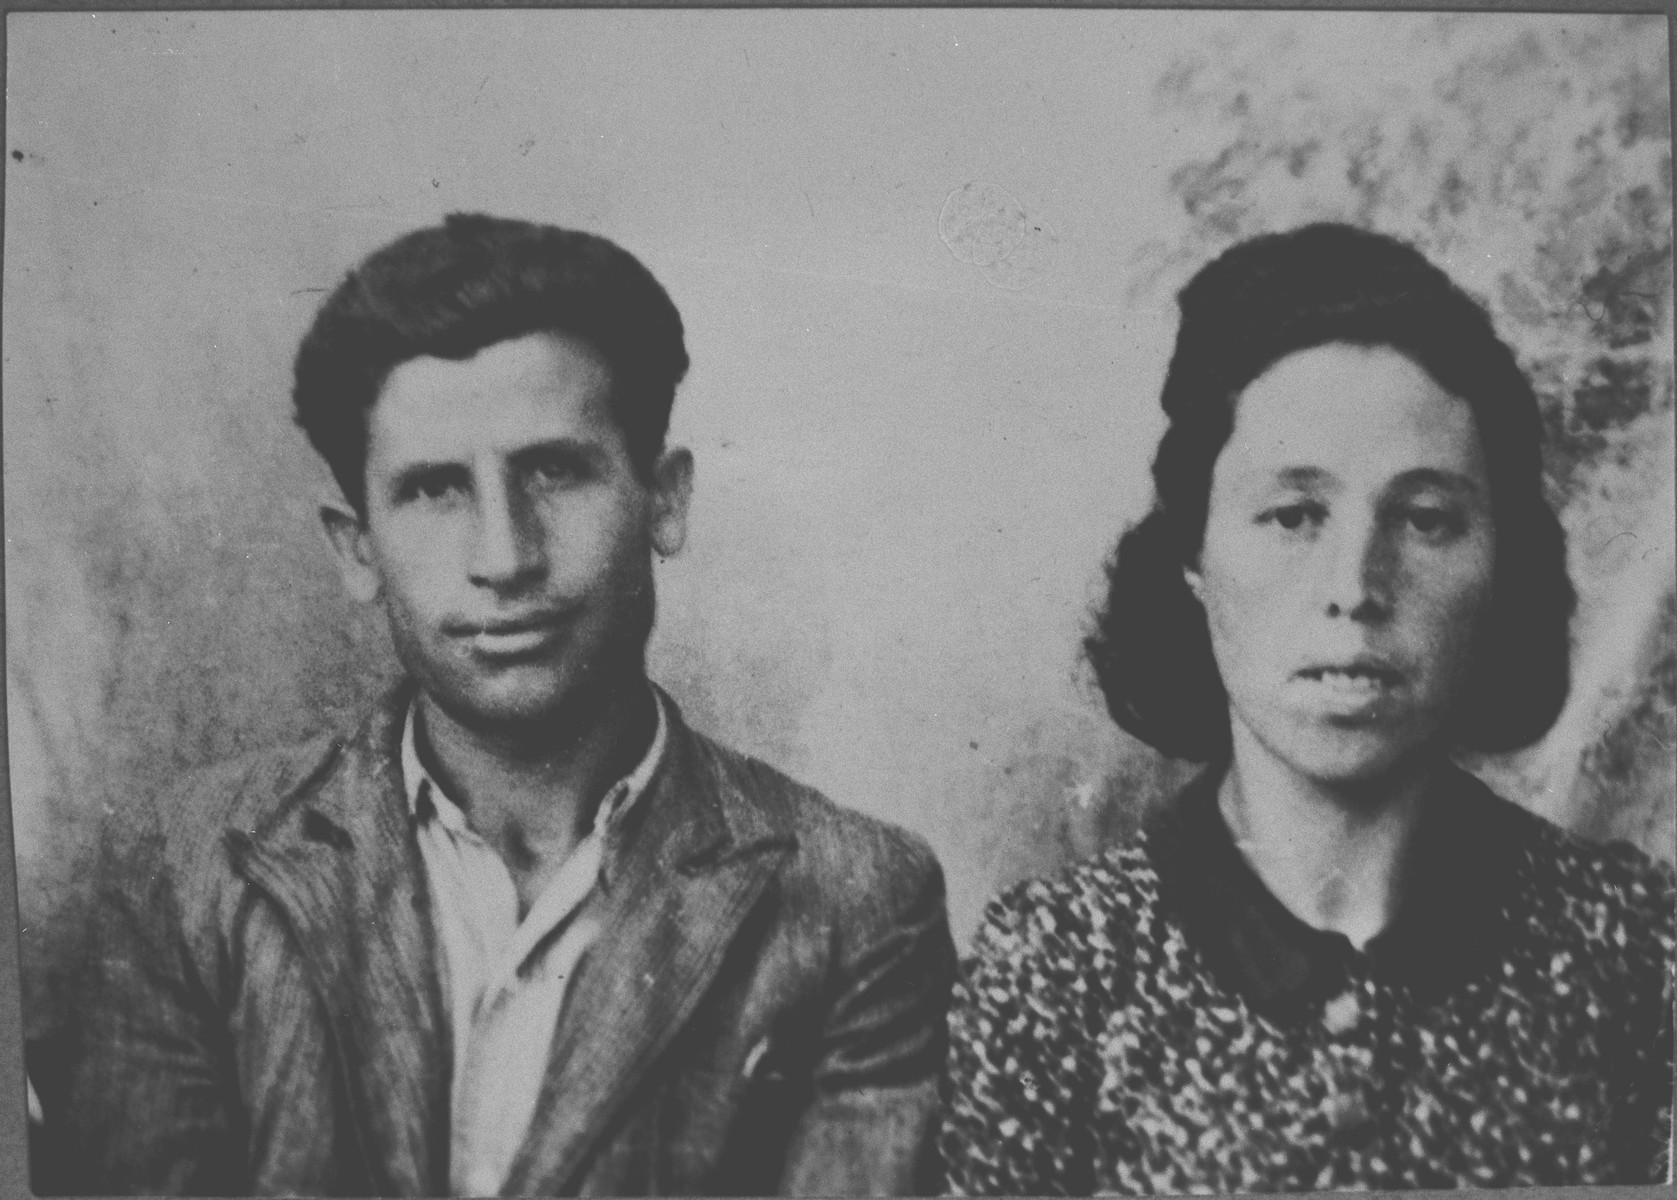 Portrait of Avram Eschkenasi, son of Mushon Eschkenasi, and Avram's wife, Klara.  Avram was a laborer.  They lived at Karagoryeva 91 in Bitola.